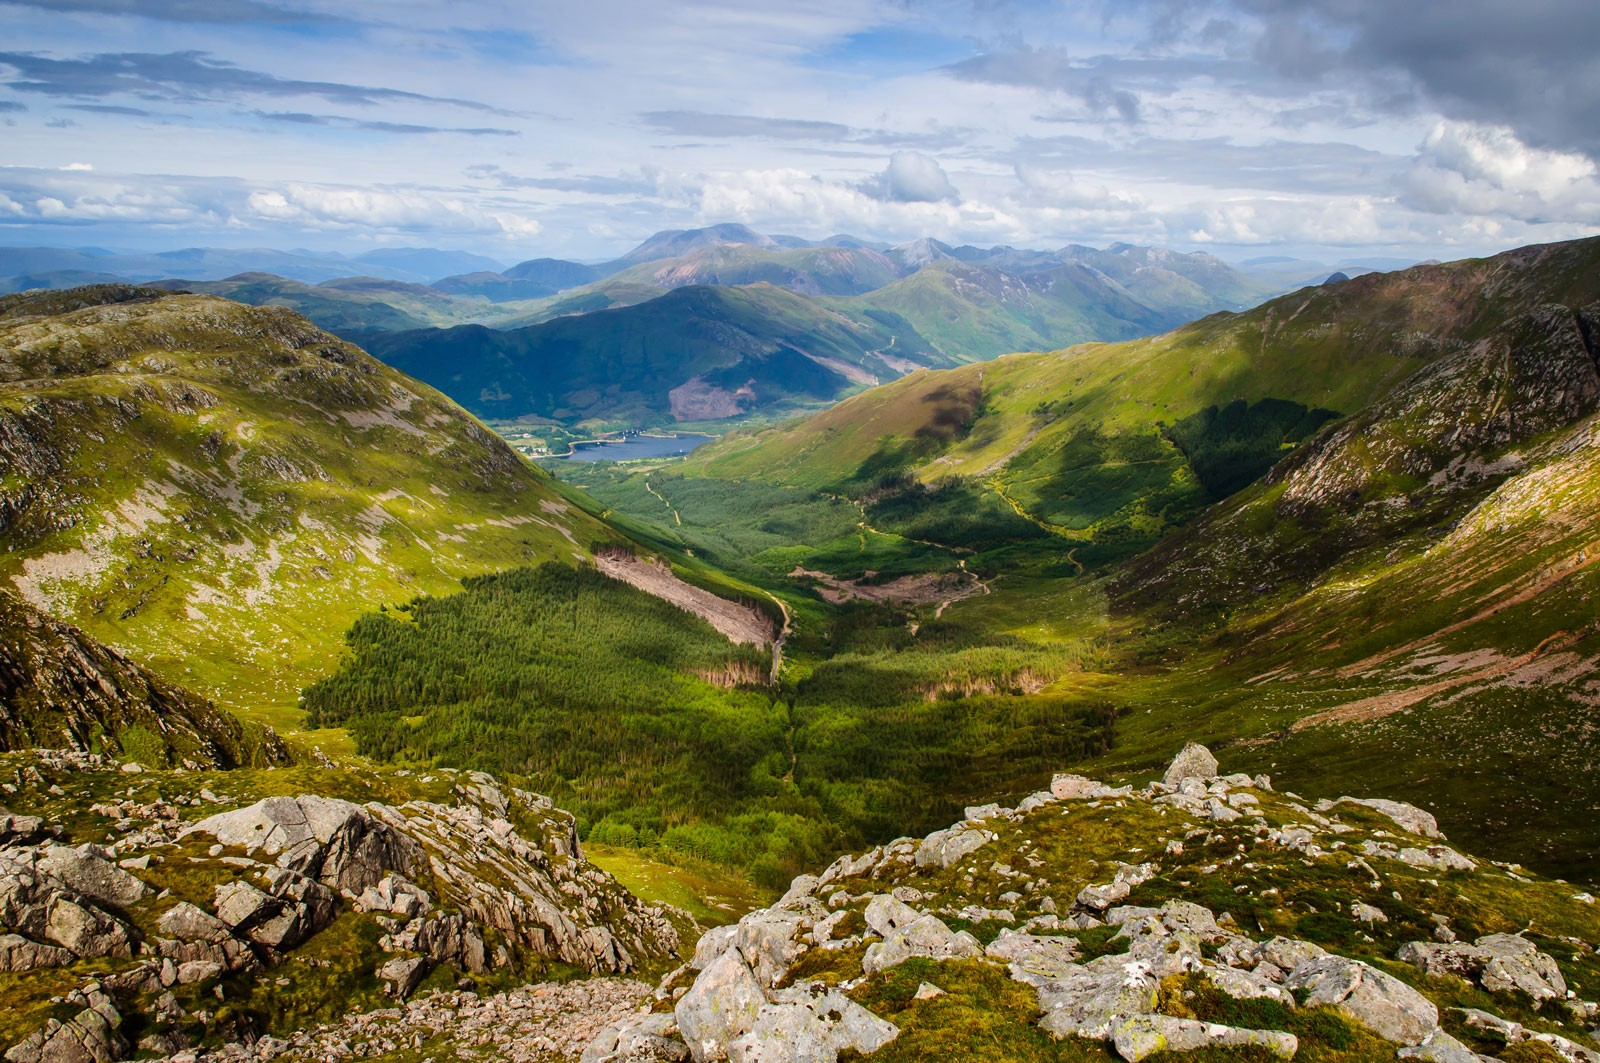 View-across-Ben-Nevis-Scotland-46125a1